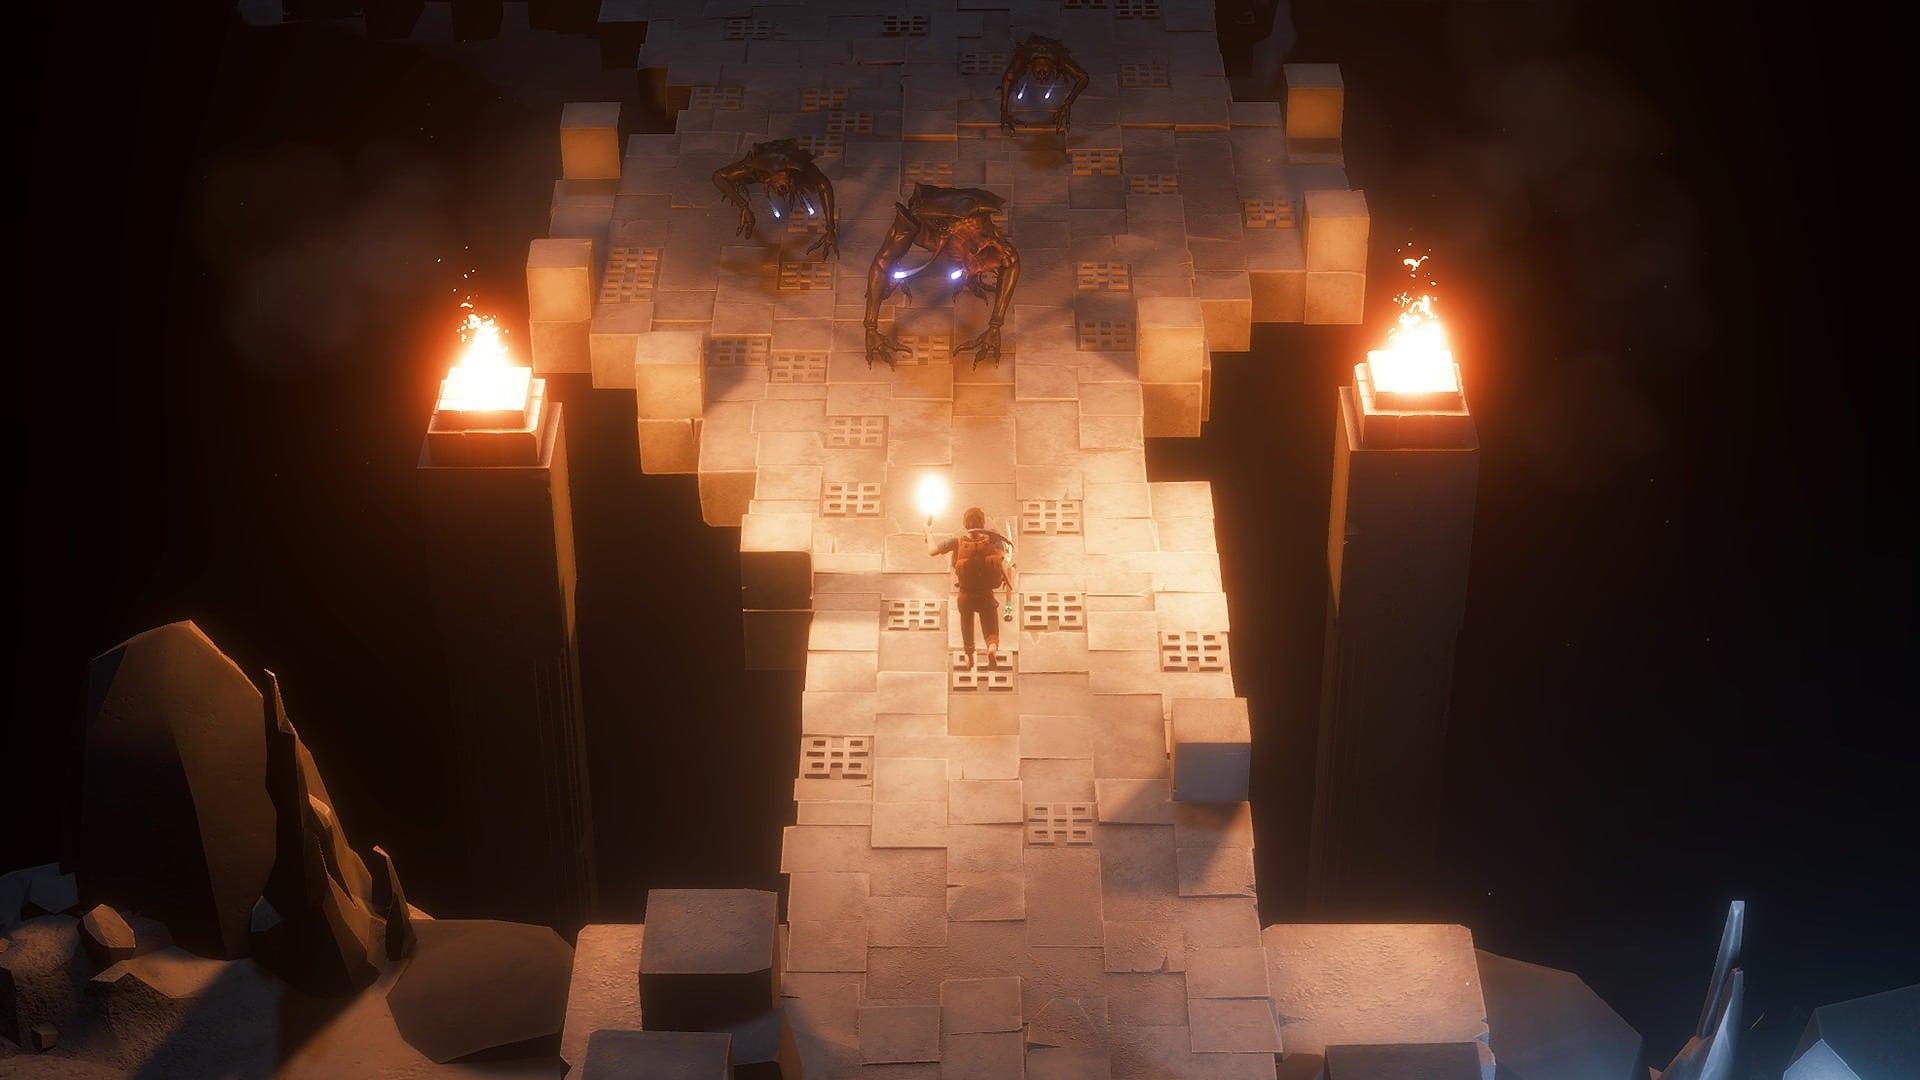 Len's Island - Gameplay